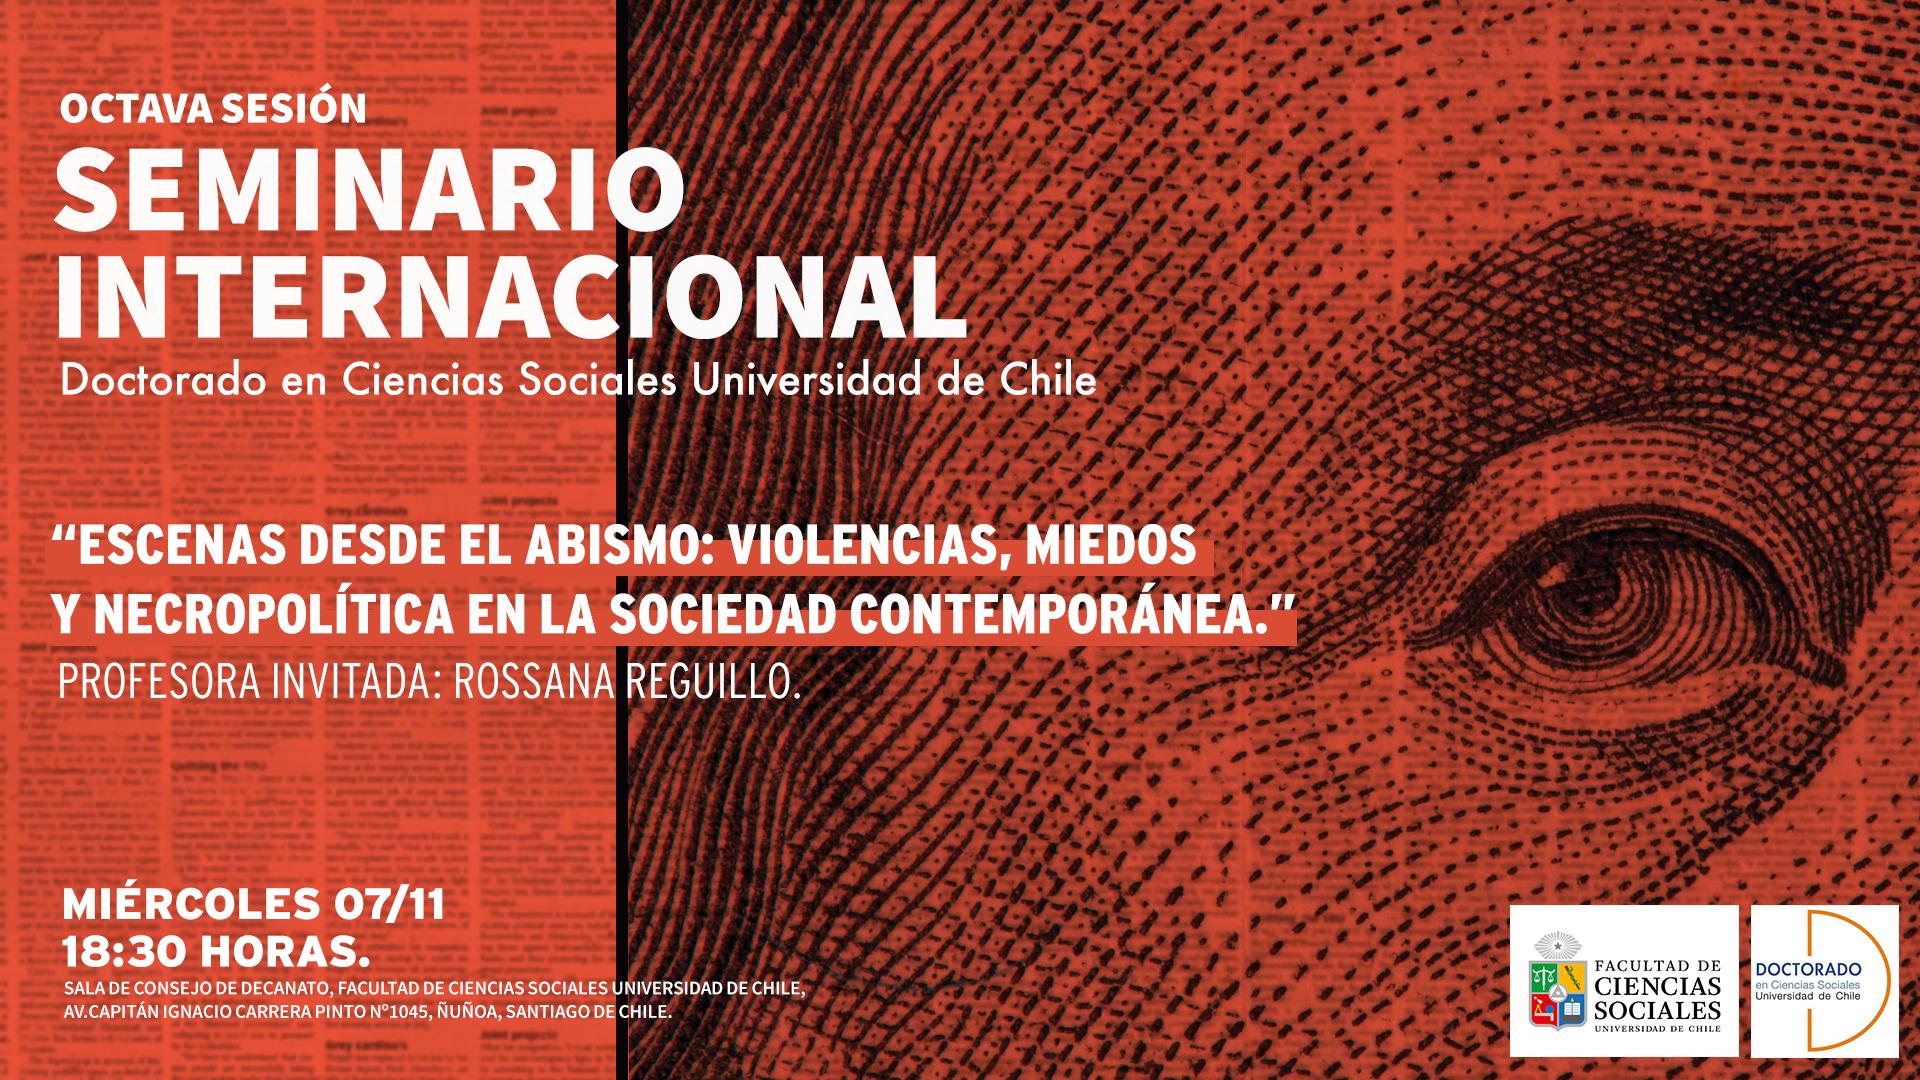 Octava Sesión Seminario Internacional Prof. Invitada: Rosana Reguillo